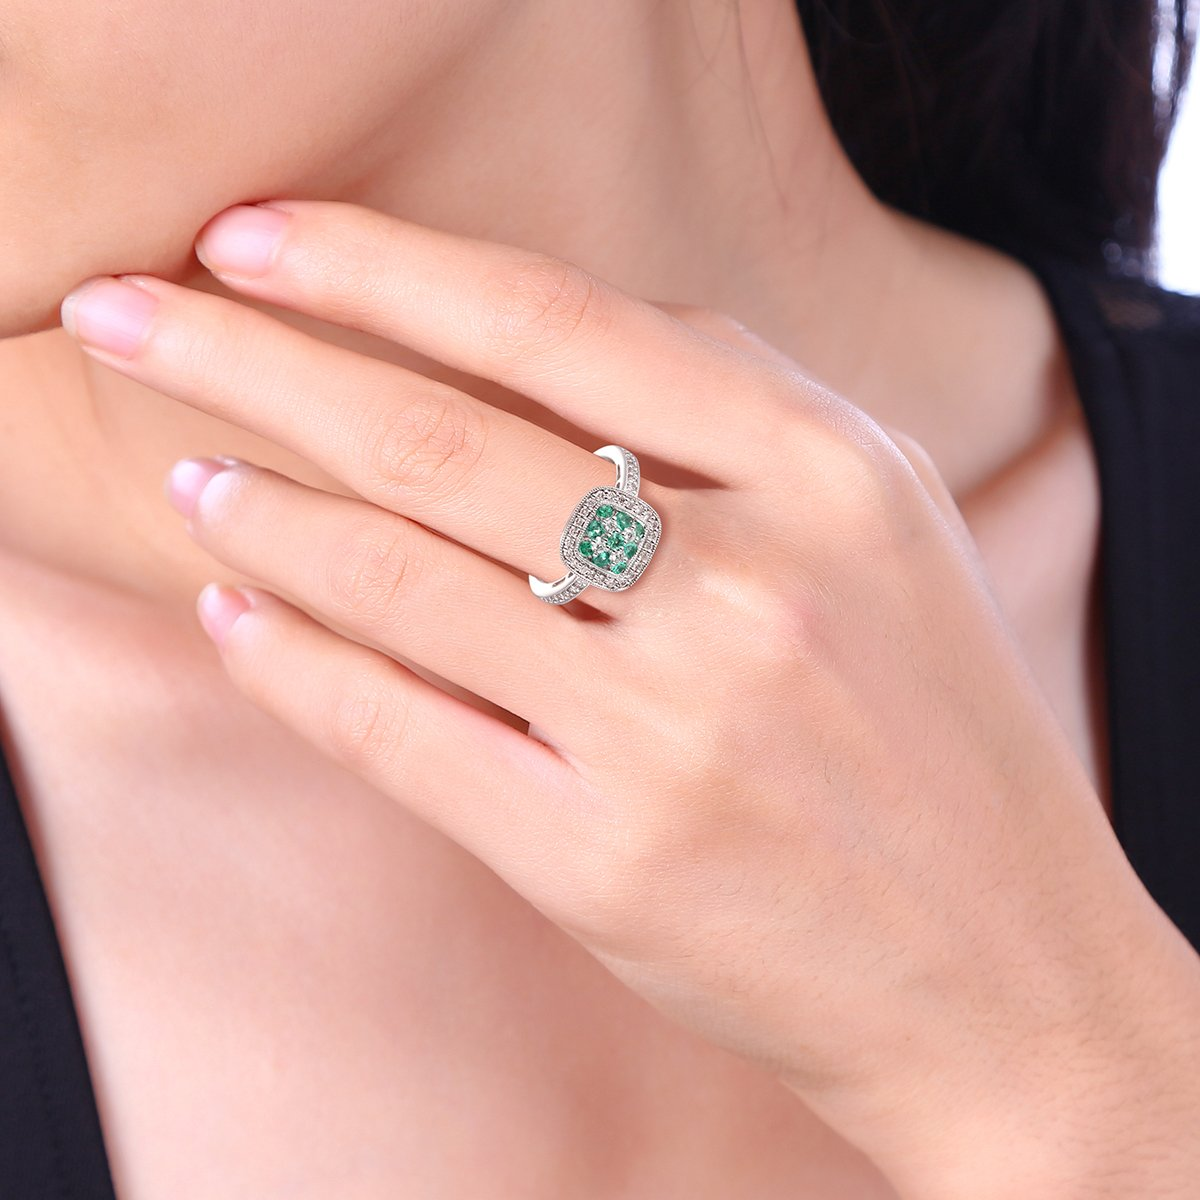 Ferhe New York Independence Day Sale, 14K Gold, Diamond & Emerald ...